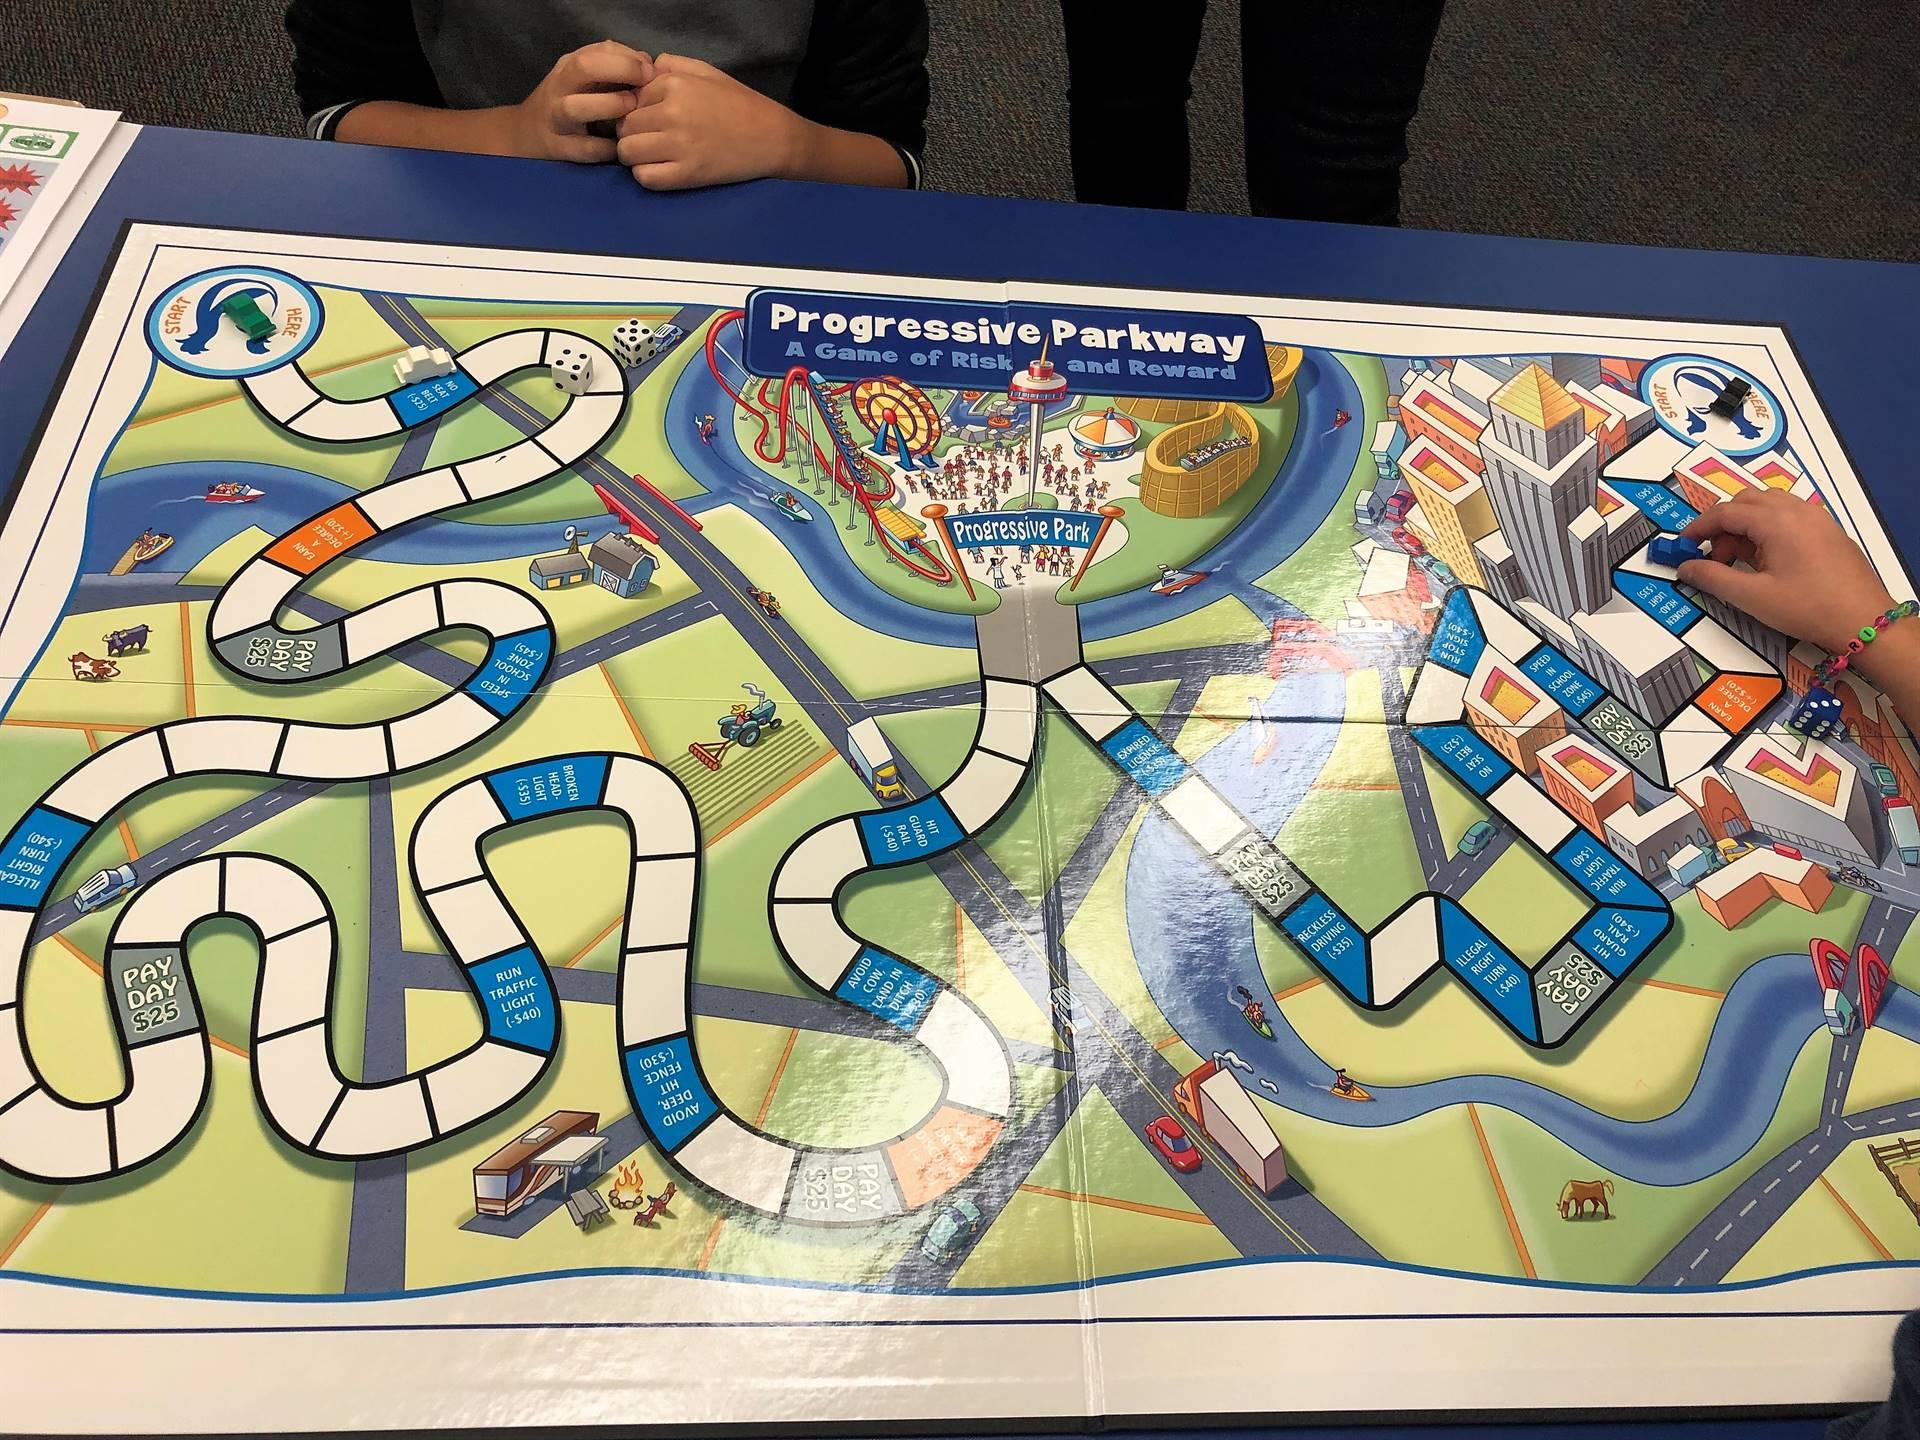 Progress Parkway Program